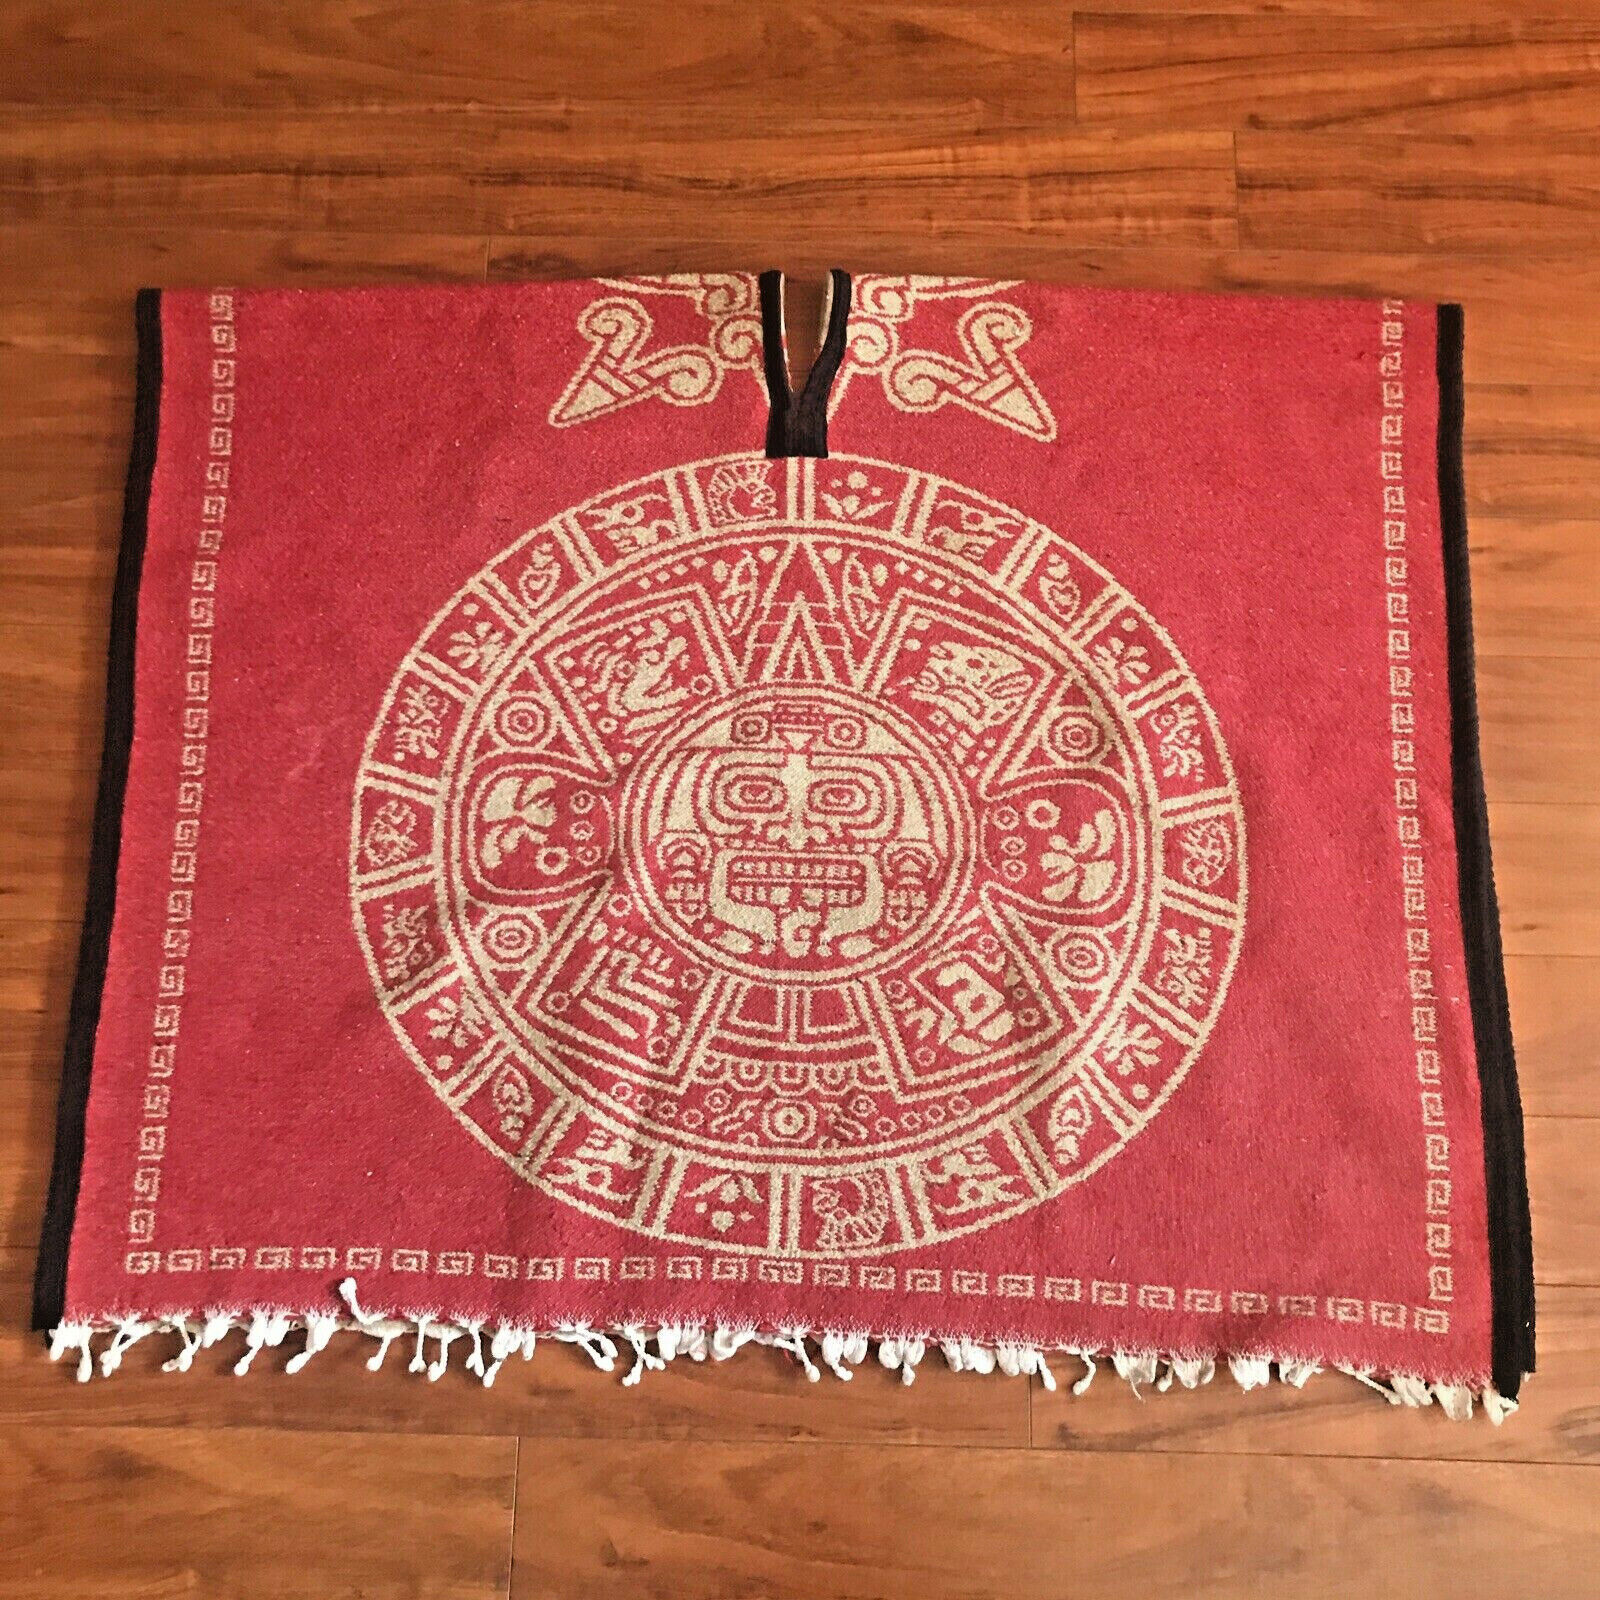 HEAVY PONCHO Gaban BLANKET Mexican TRIBAL Calendario Azteca Red White ONE SIZE